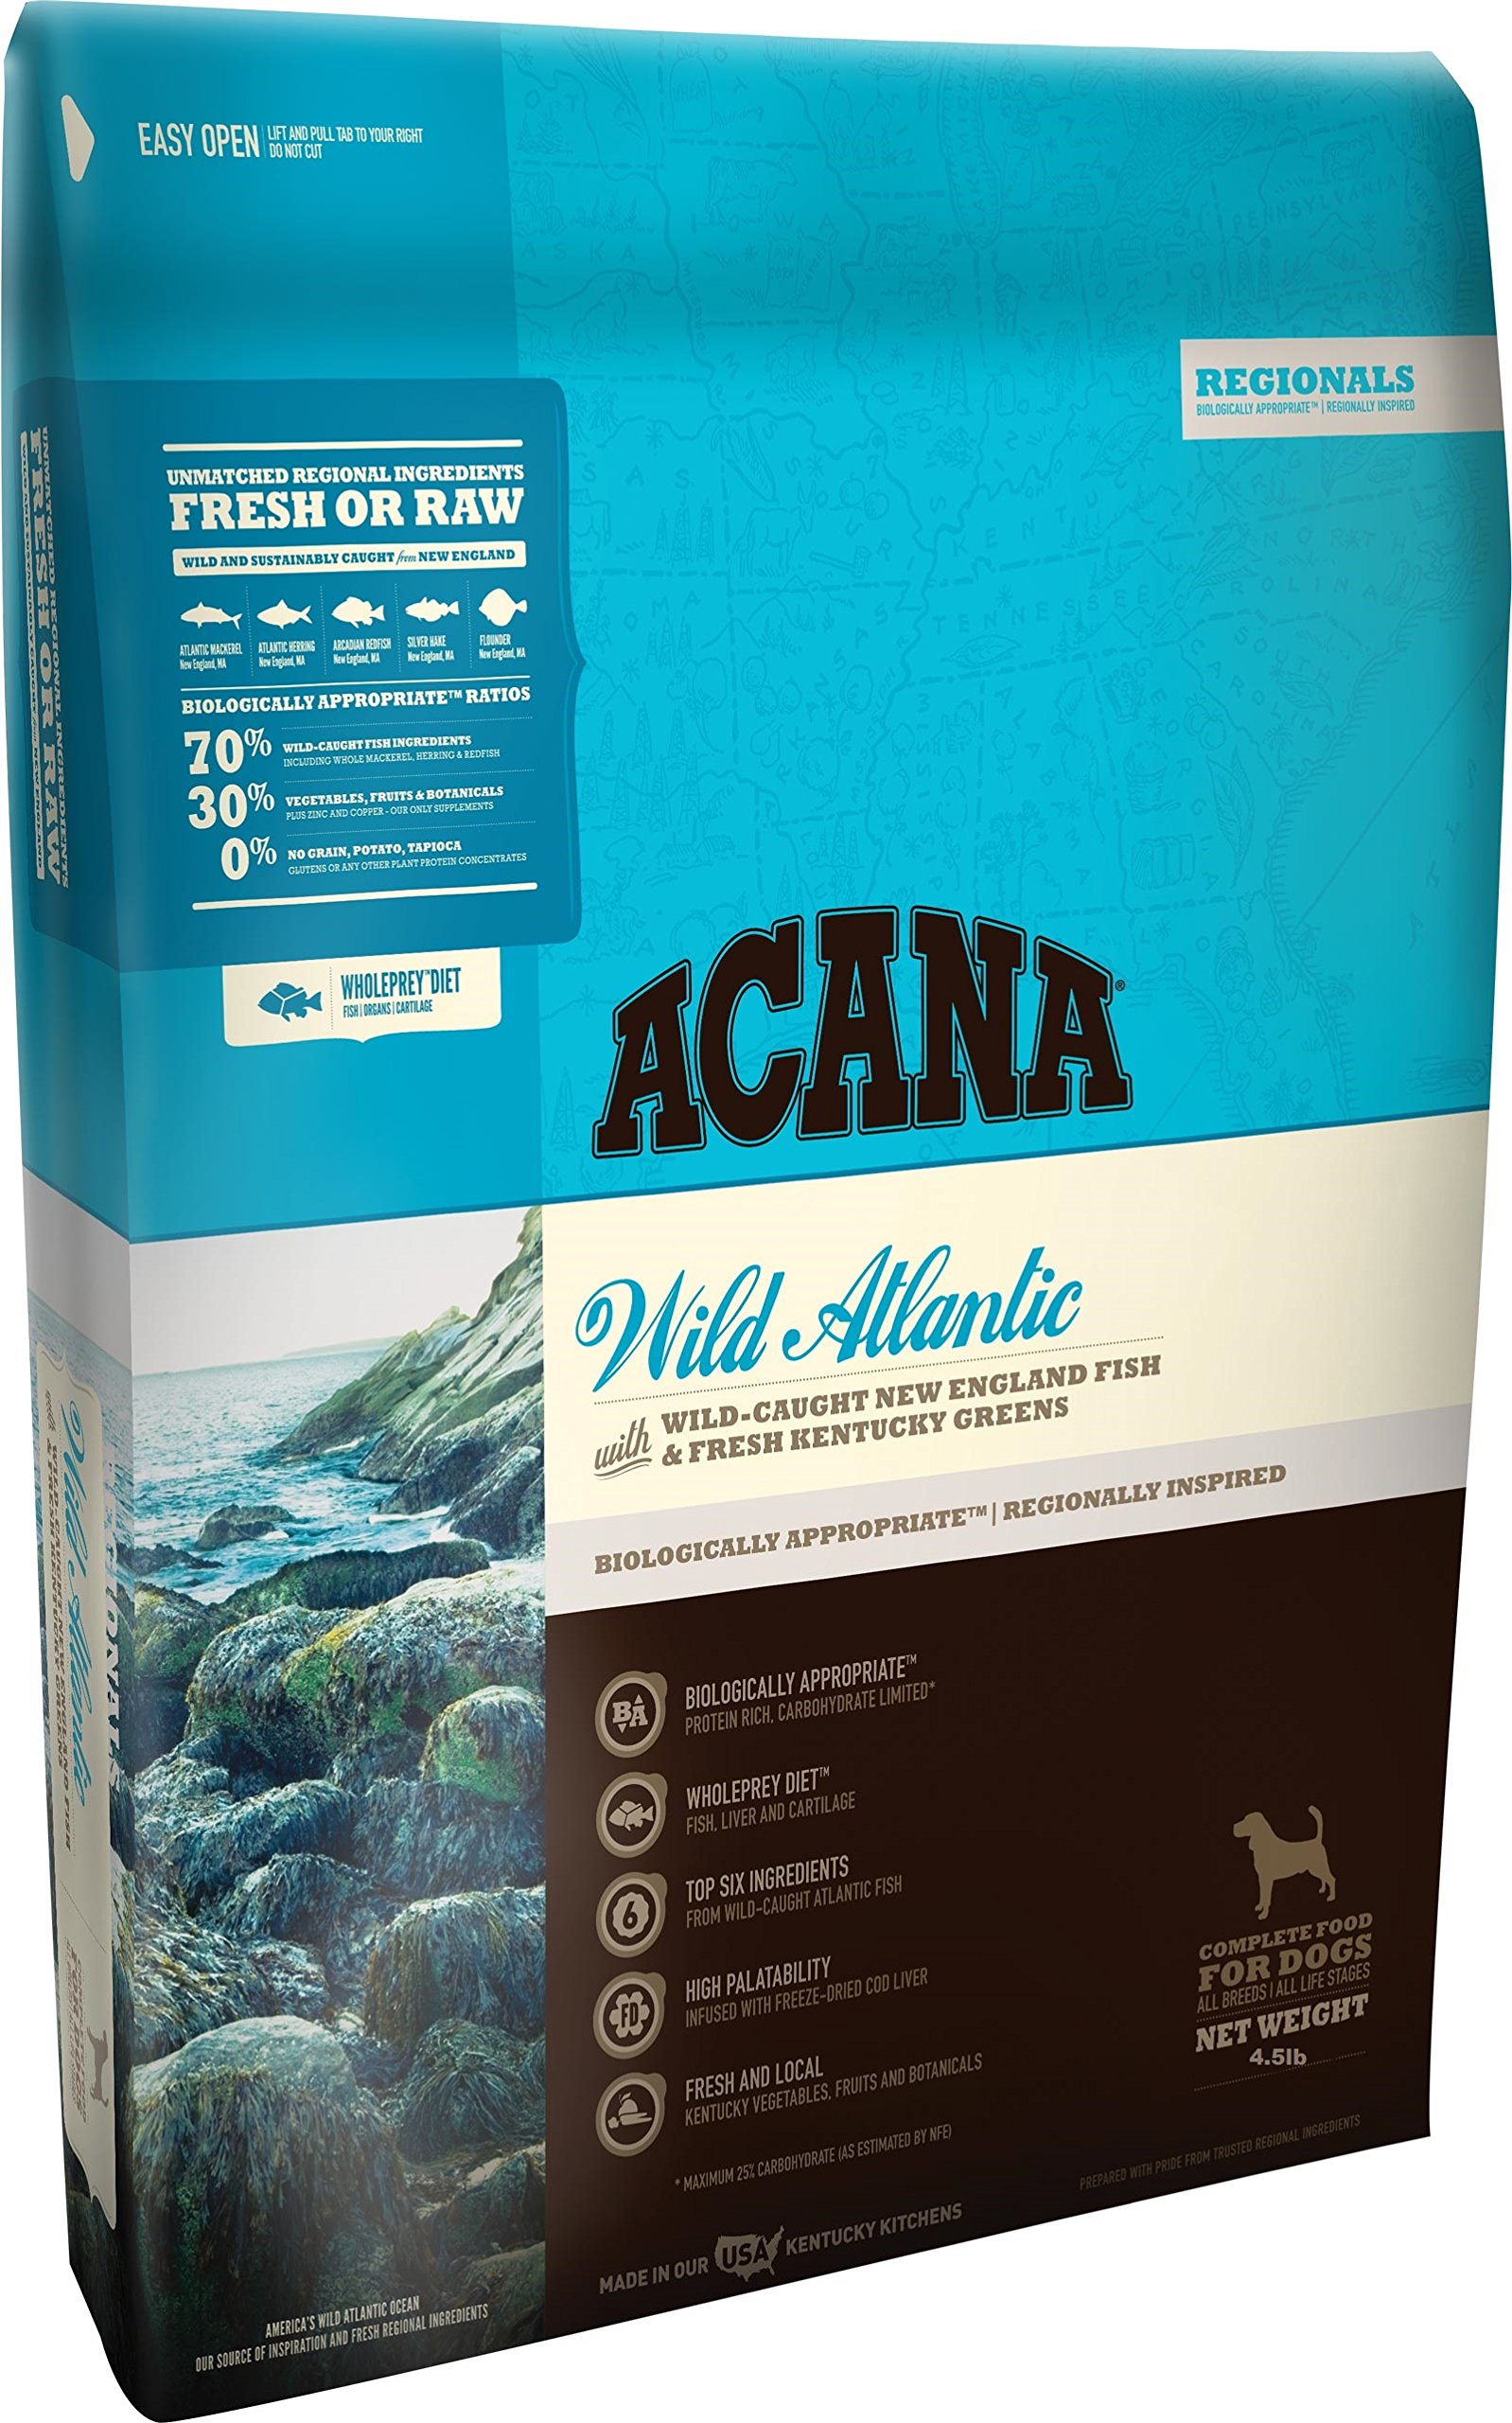 ACANA Regionals Wild Atlantic for Dogs, 4.5 Pound Bag